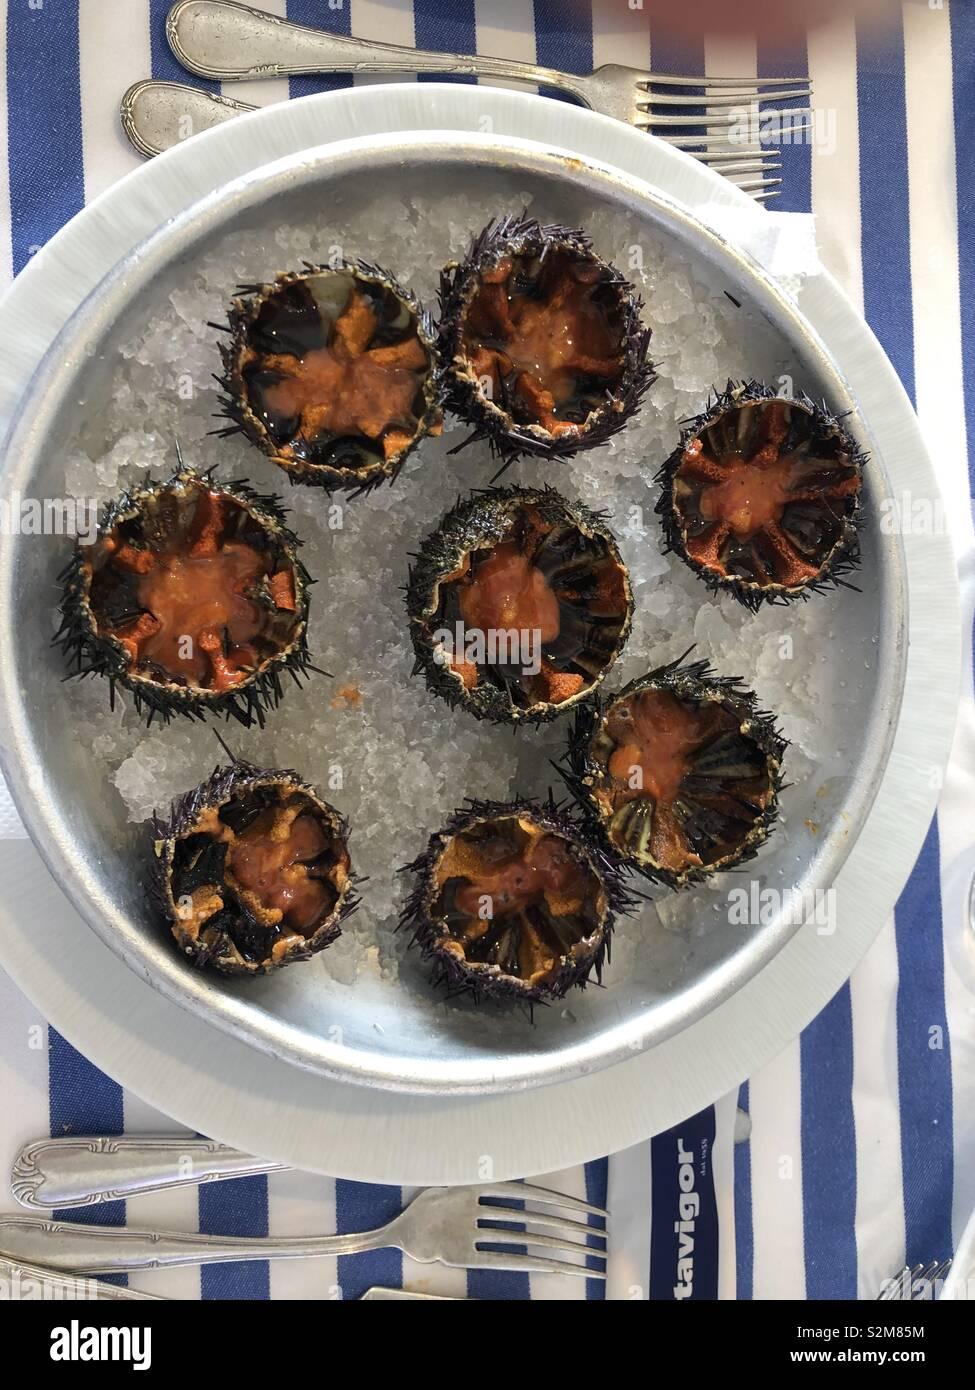 Sea urchins Ricci crudi gourmet meal dish restaurant lifestyle high end luxury living Stock Photo